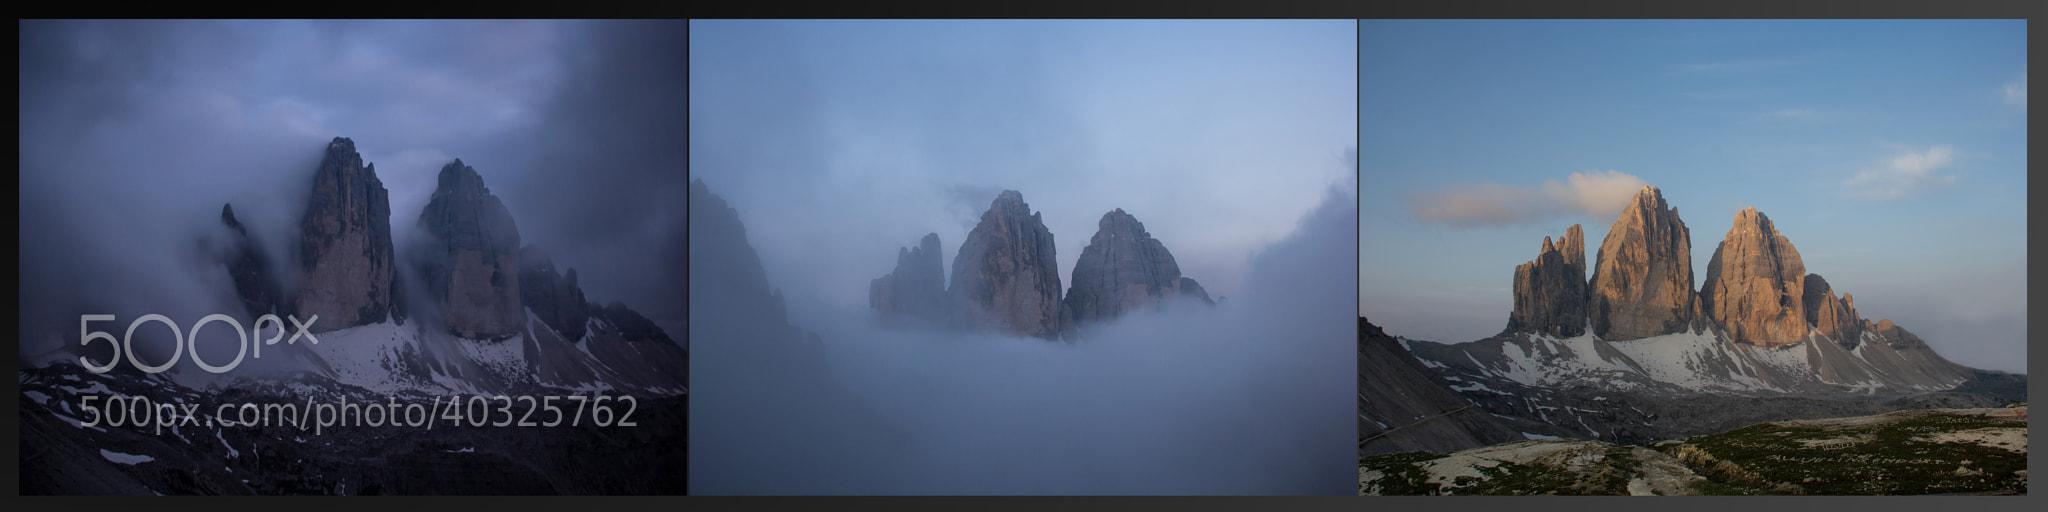 Photograph 3 Zinnen - Dolomiti by Martin Peintner on 500px